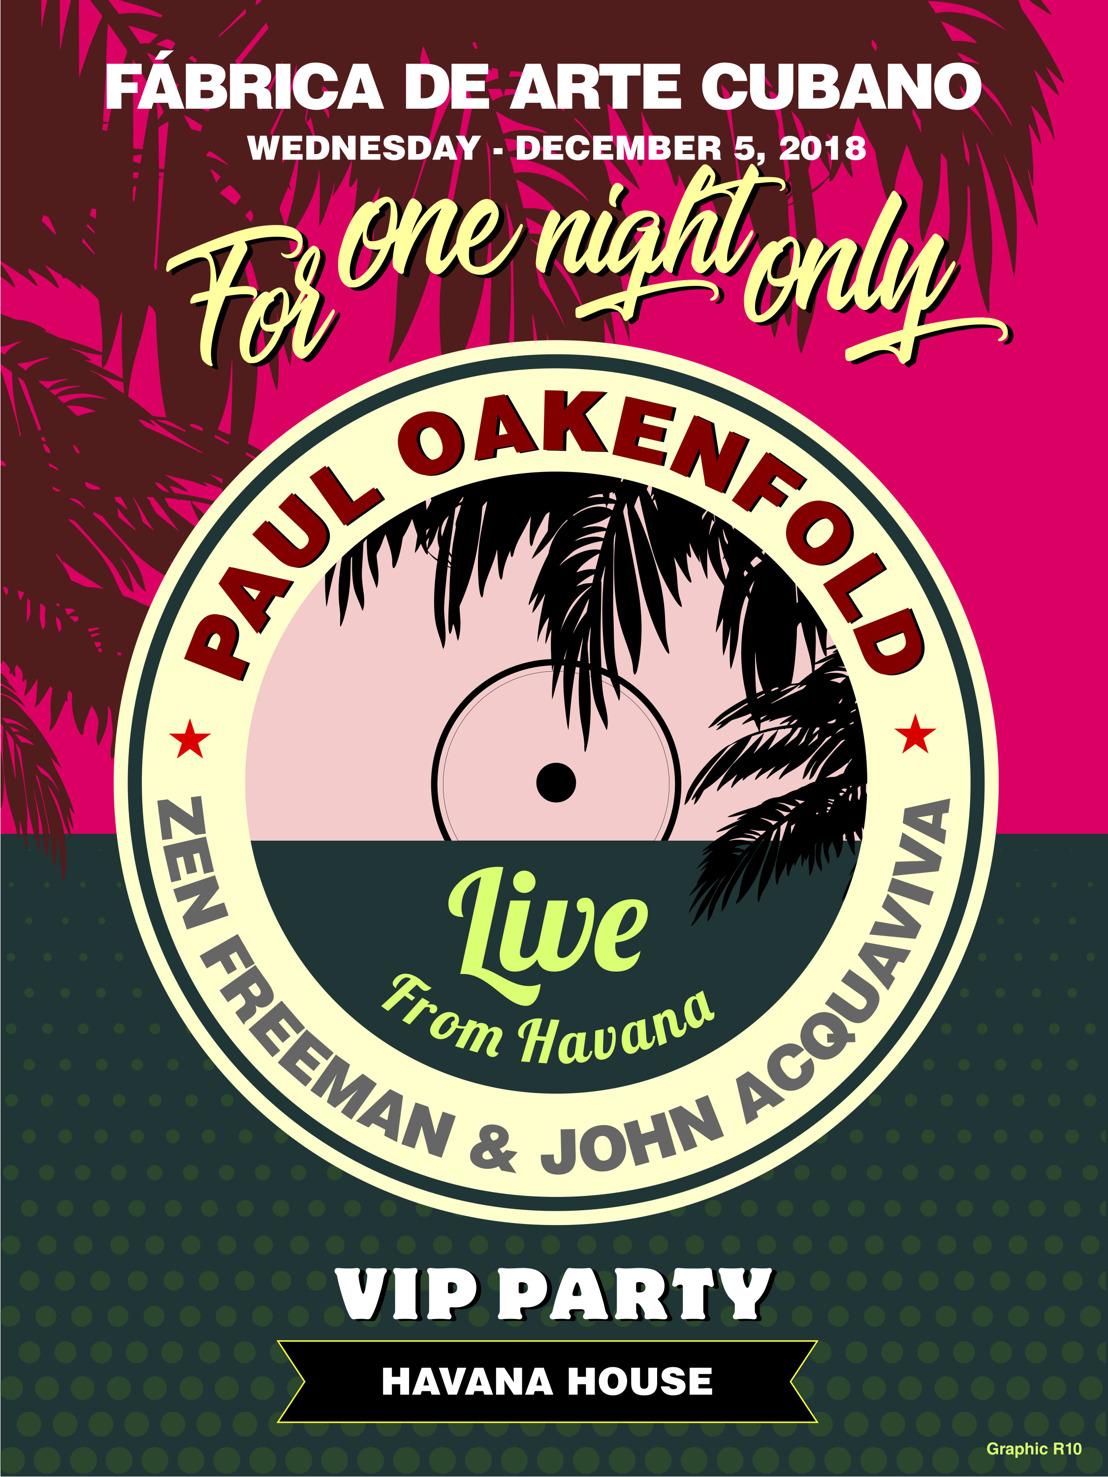 Paul Oakenfold Announces His Return to Cuba for a Live Concert at Fabrica de Arte Cubano, Havana's Creative Epicenter